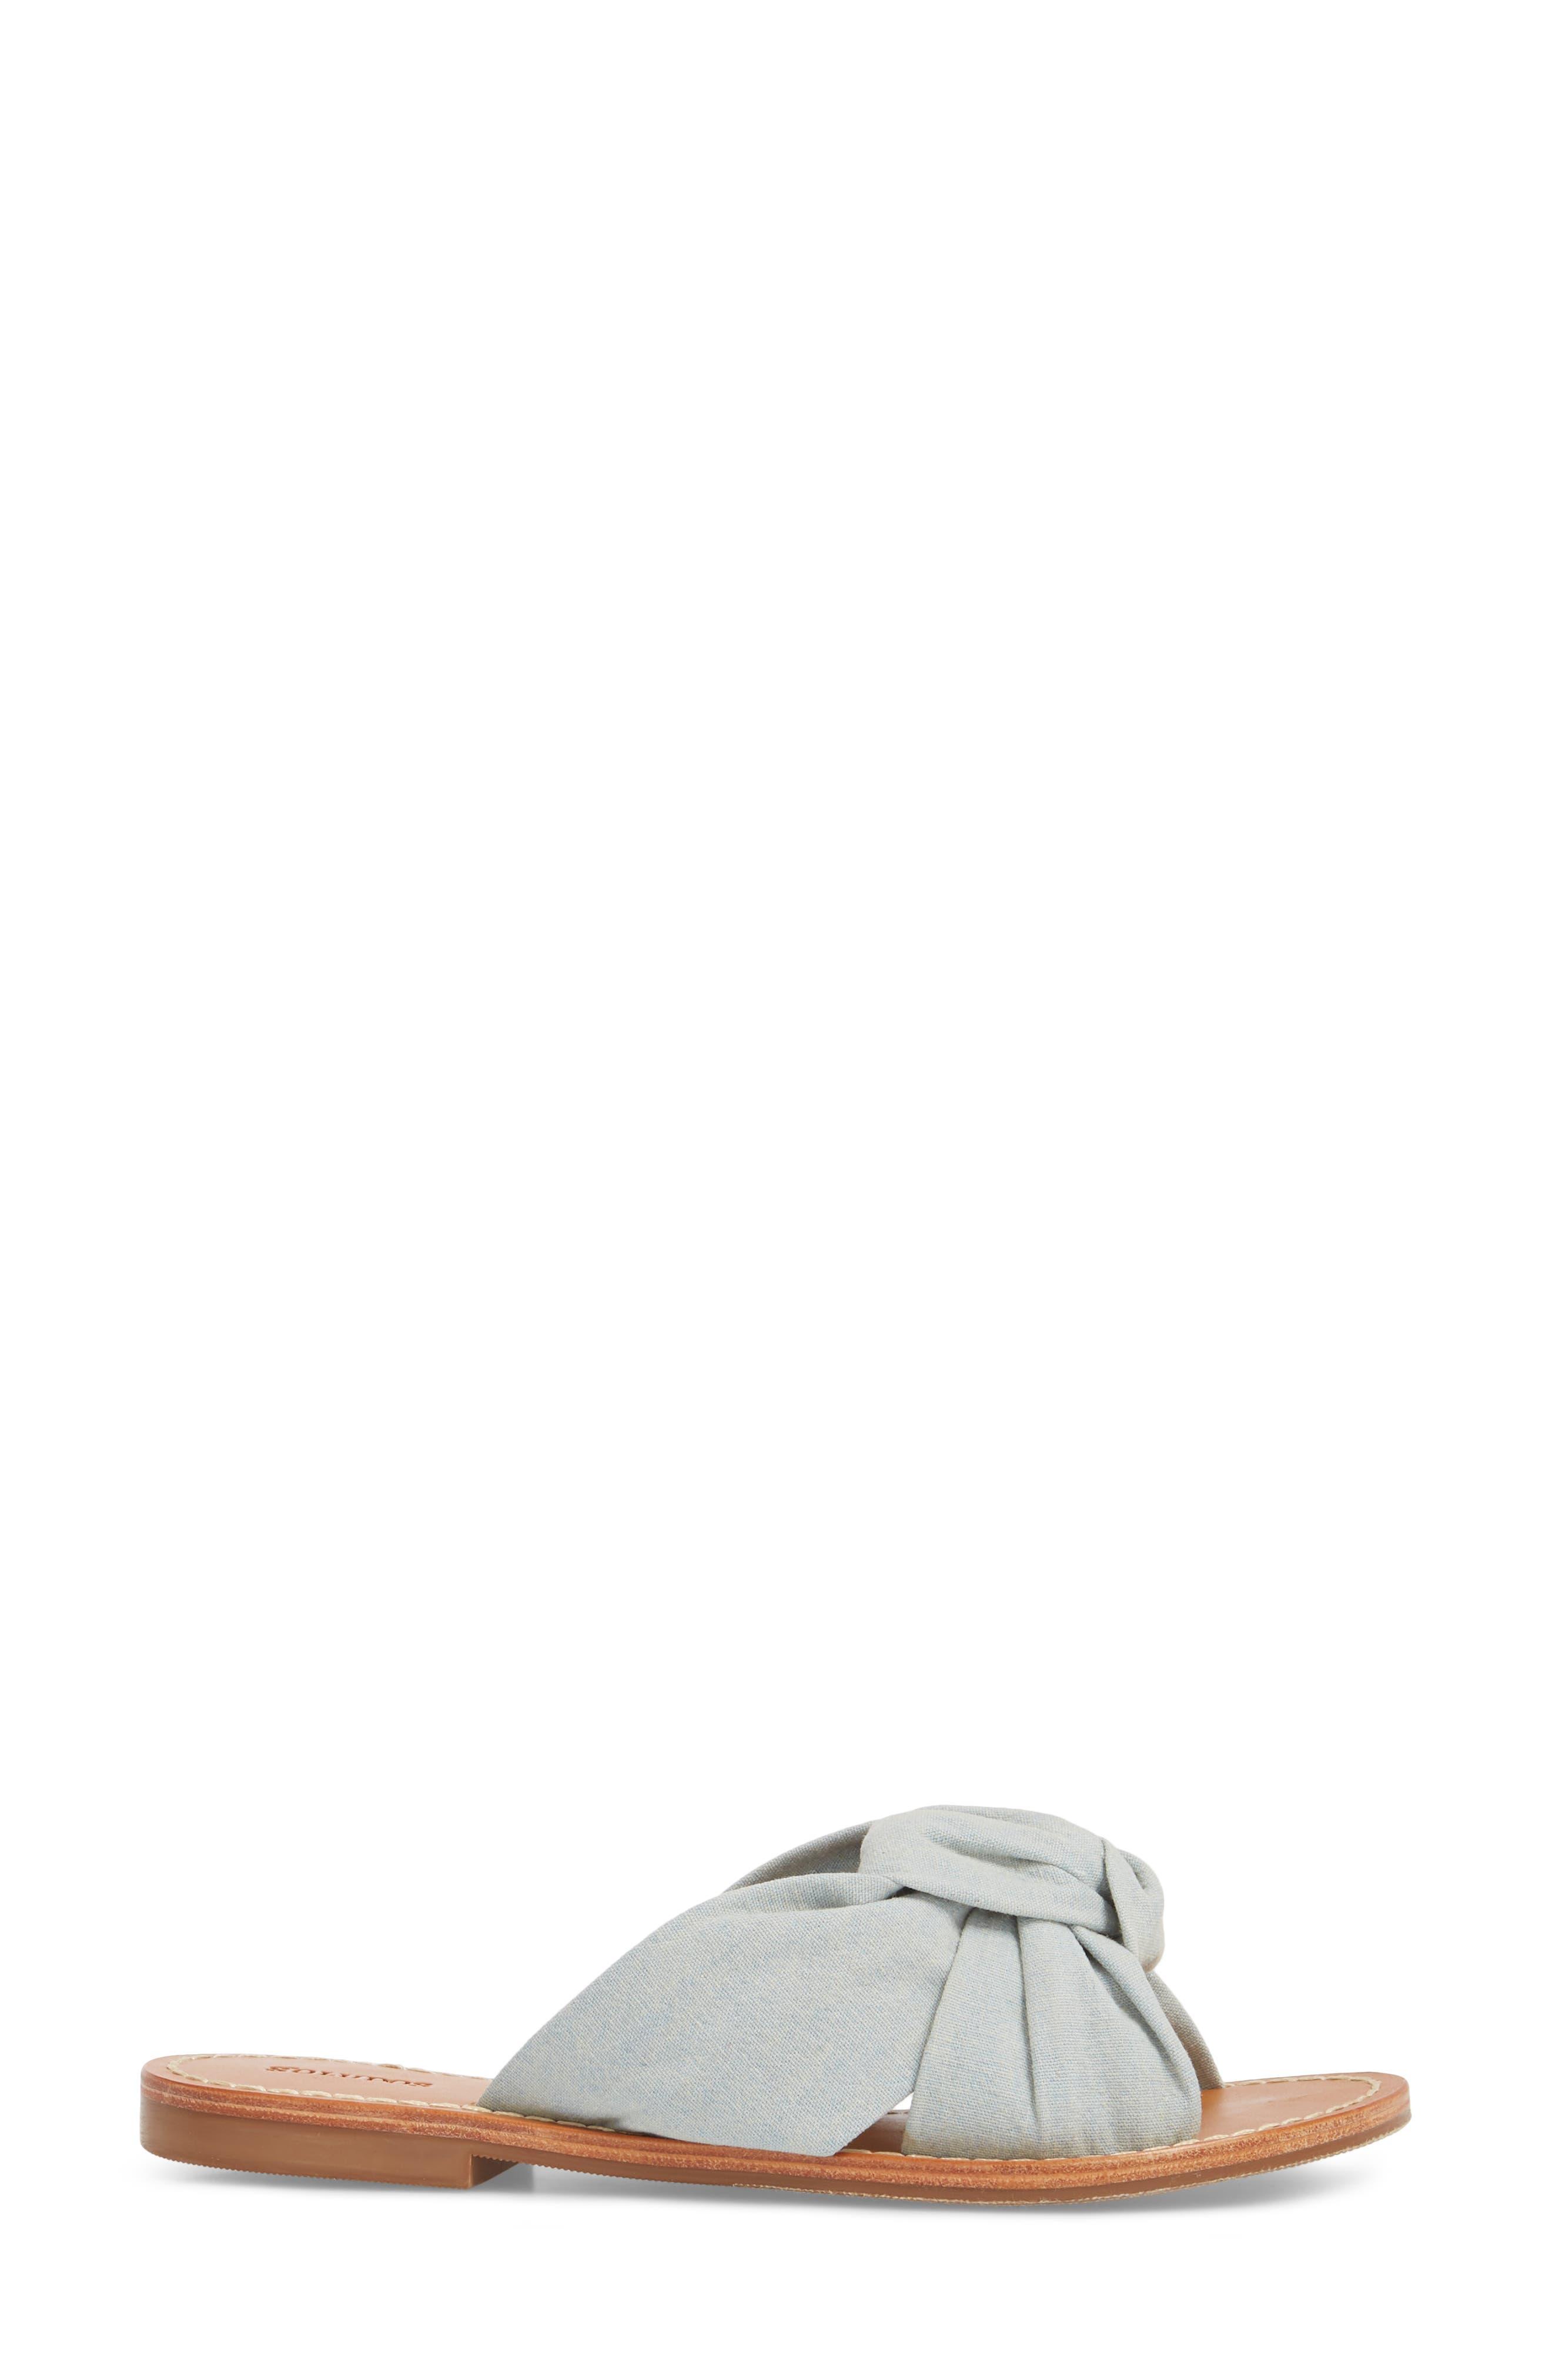 Knotted Slide Sandal,                             Alternate thumbnail 3, color,                             420